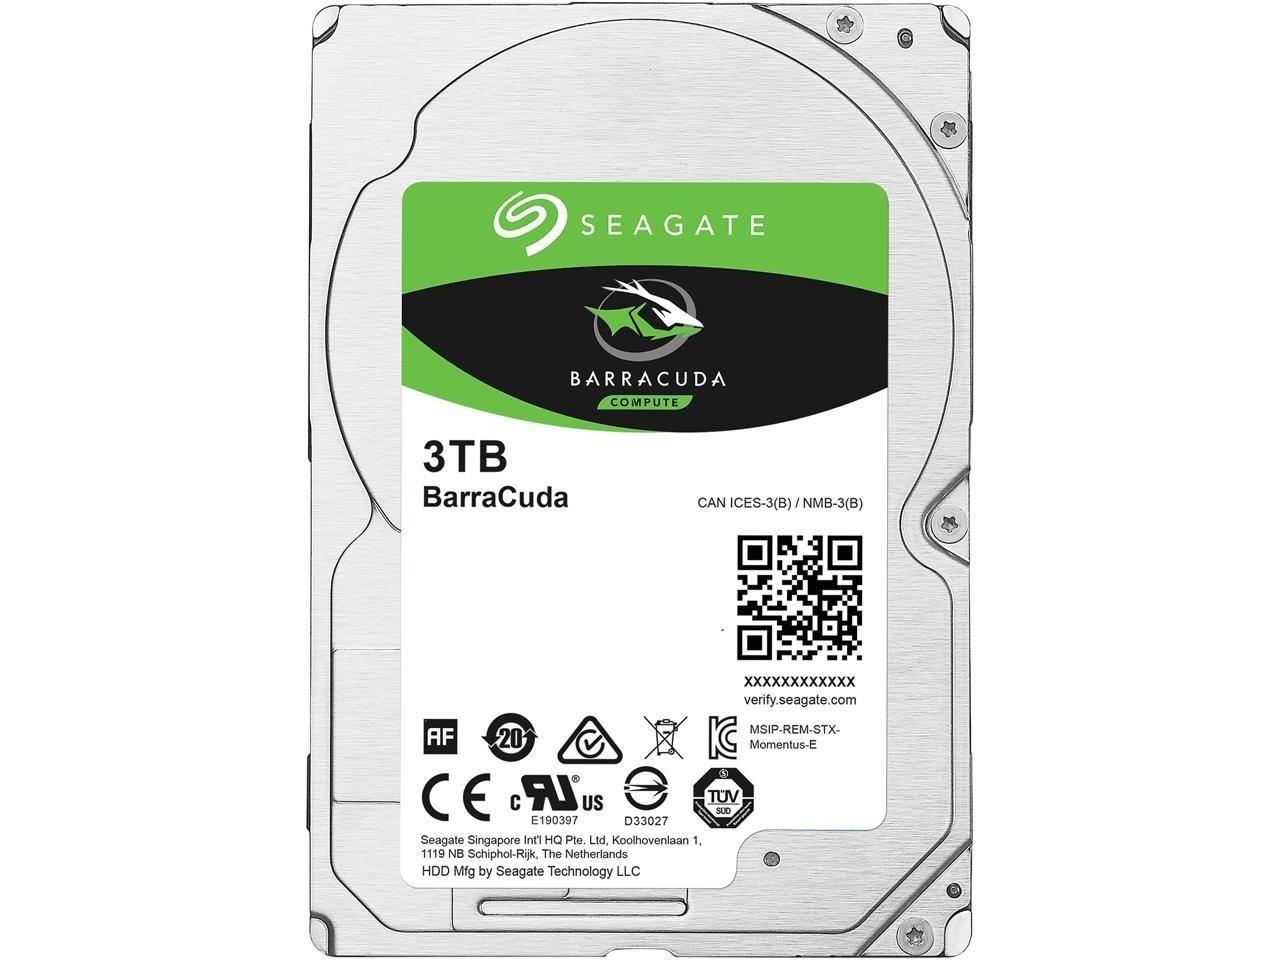 "Image 1 of Seagate Barracuda Internal 2.5"" Sata Drive 3Tb 6Gb/S 5400Rpm 2Yr Wty ST3000LM024 ST3000LM024"